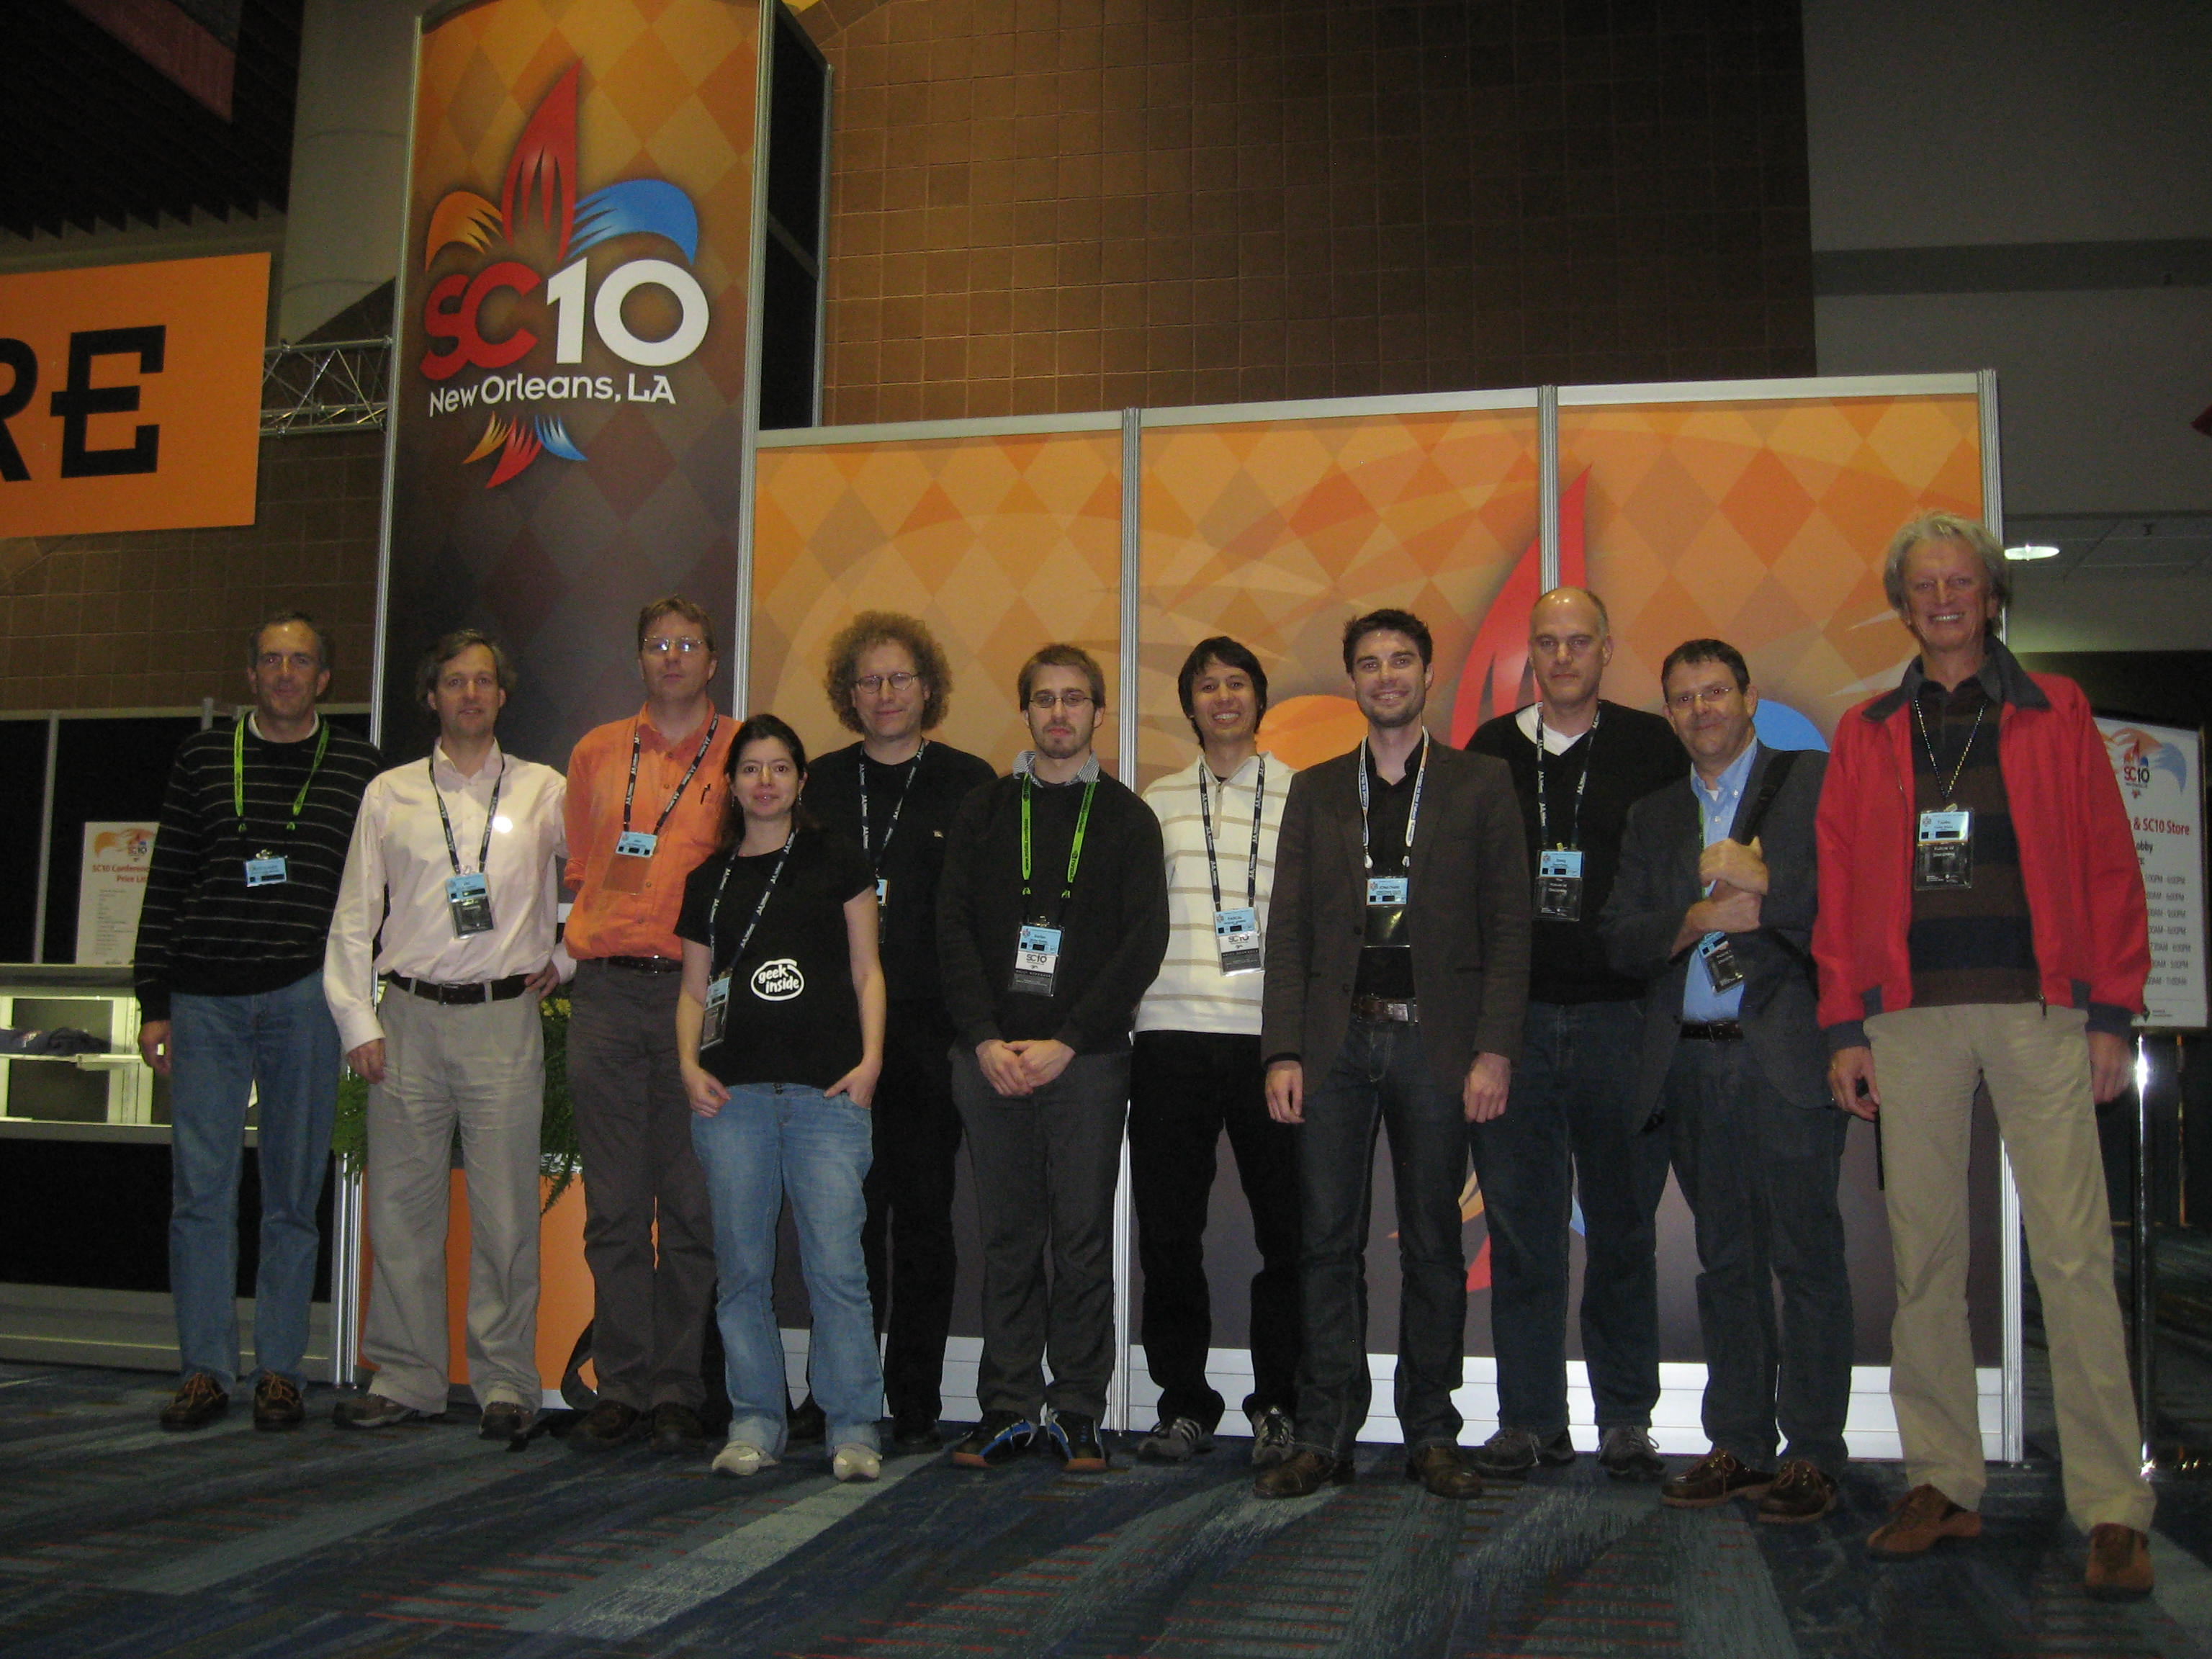 hpc-ch Delegation at SC10